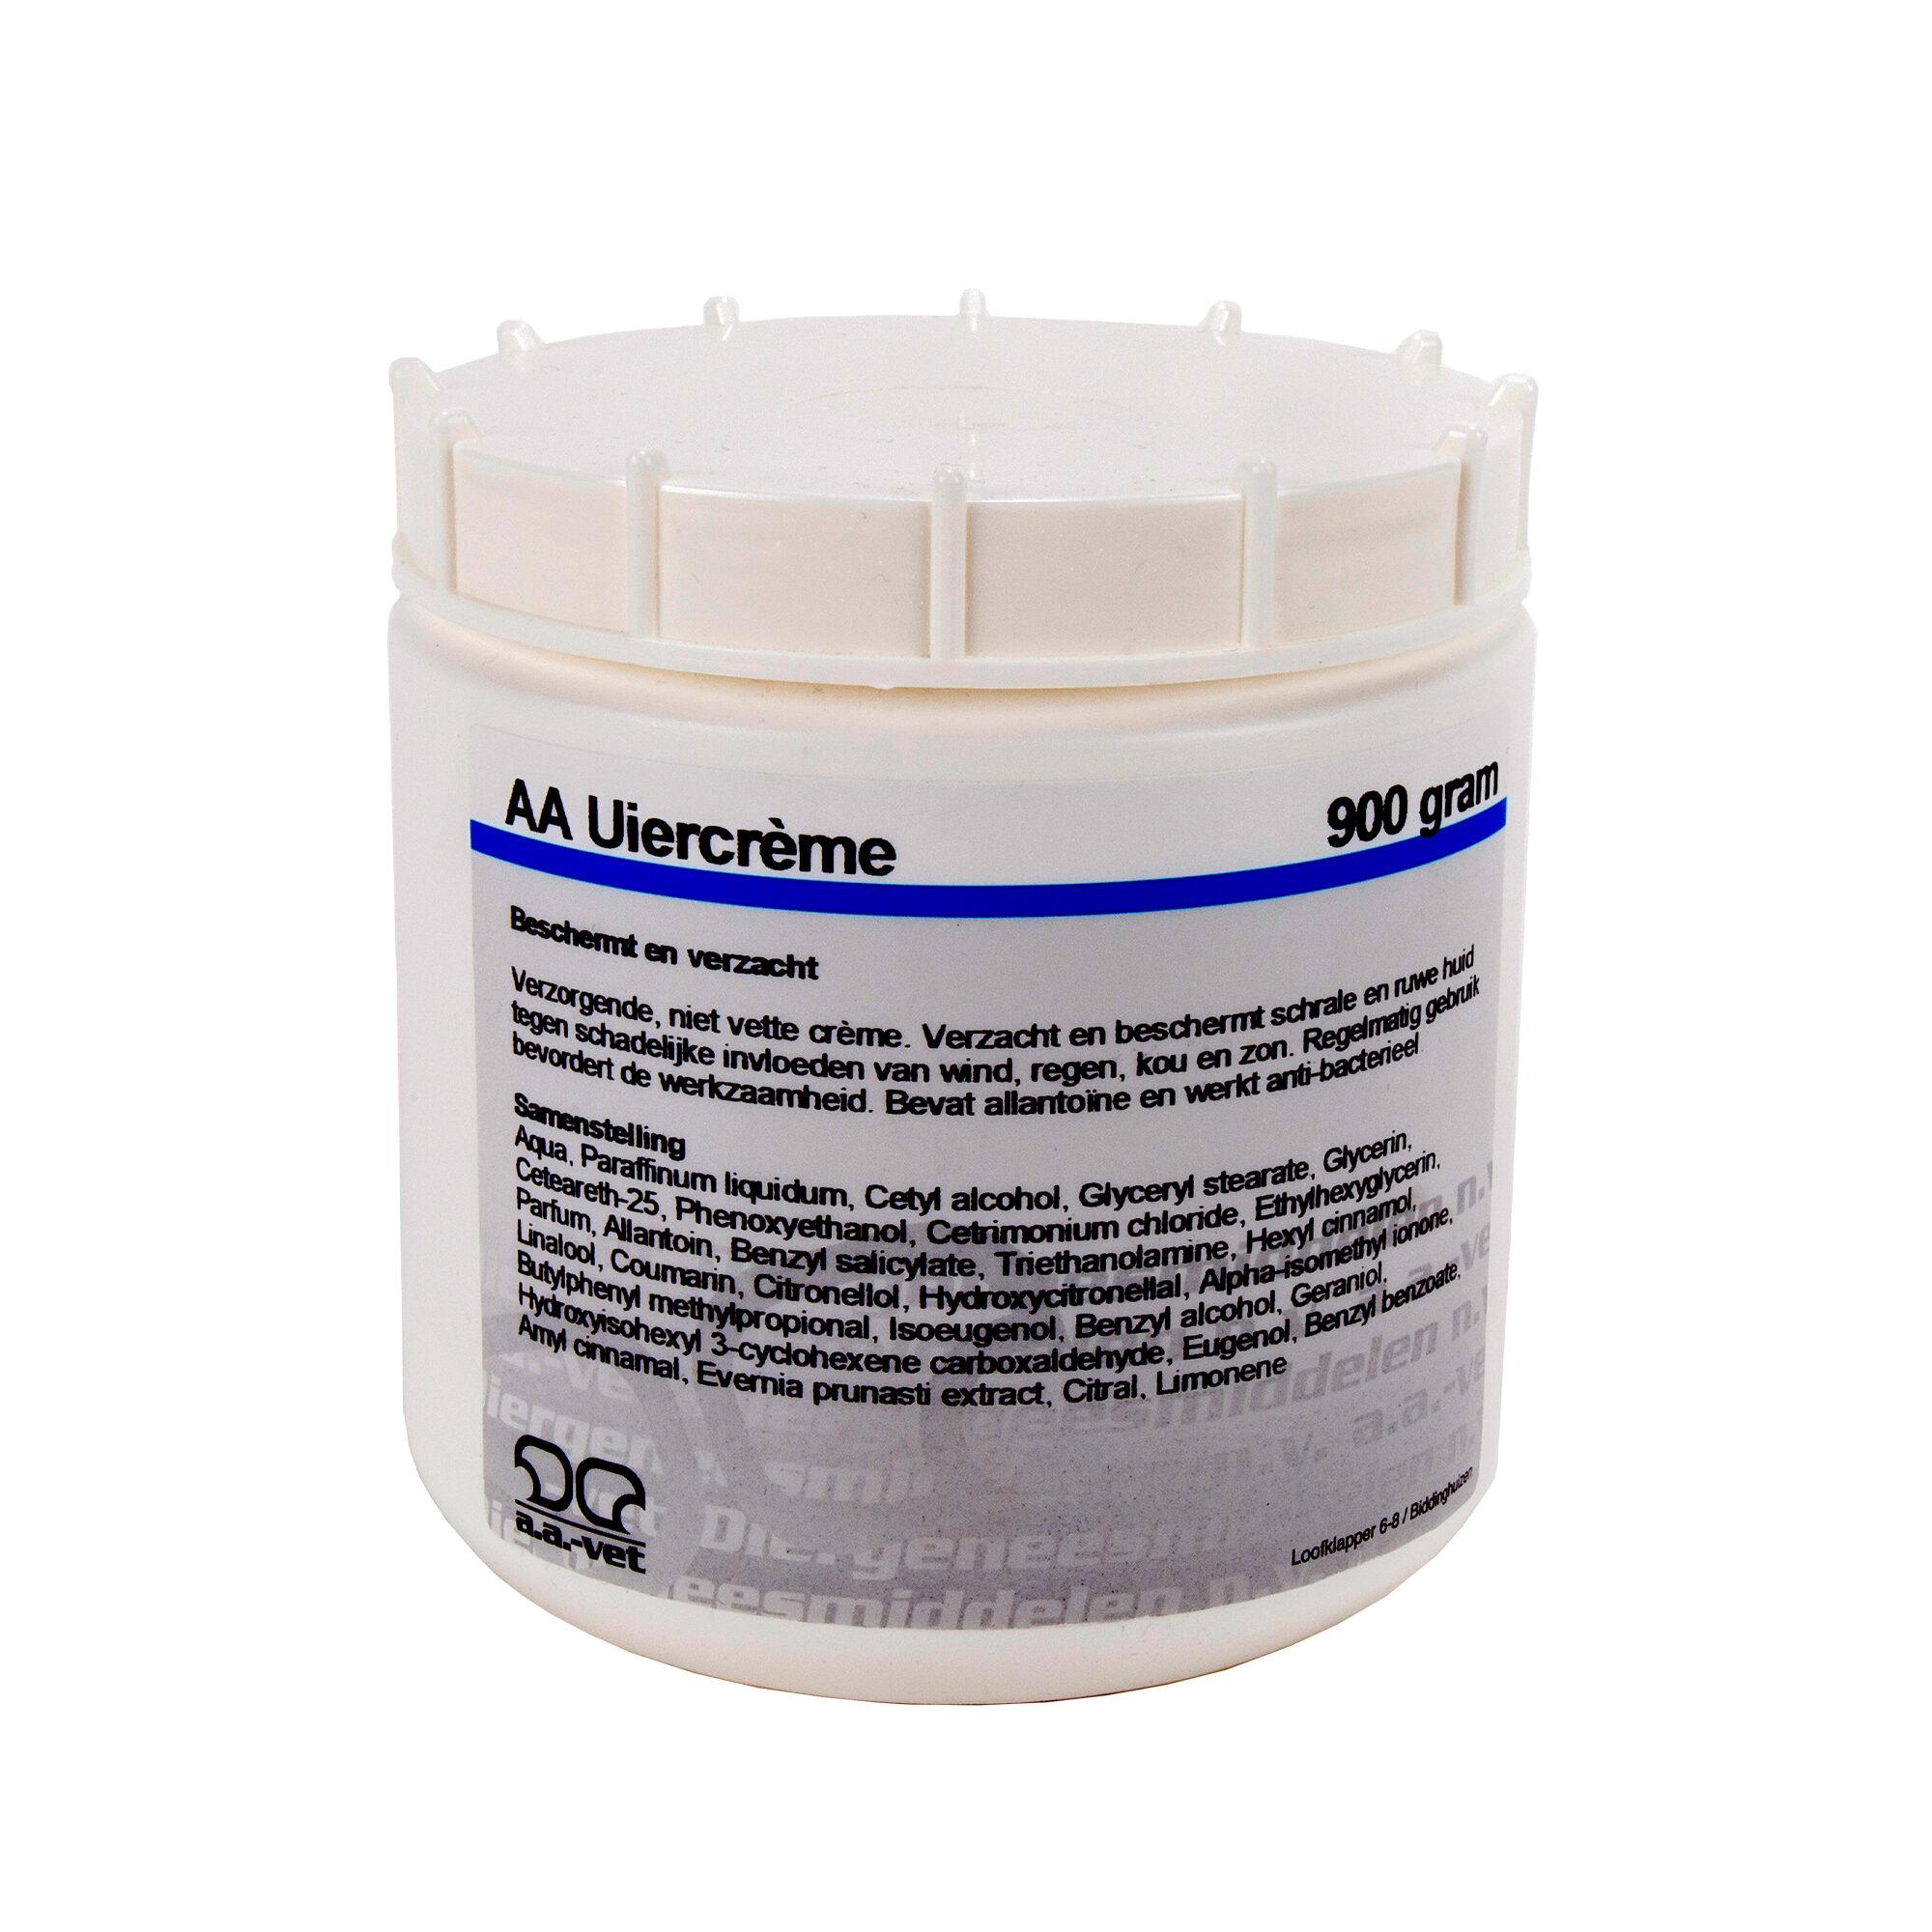 AA Uiercrème - 900 g